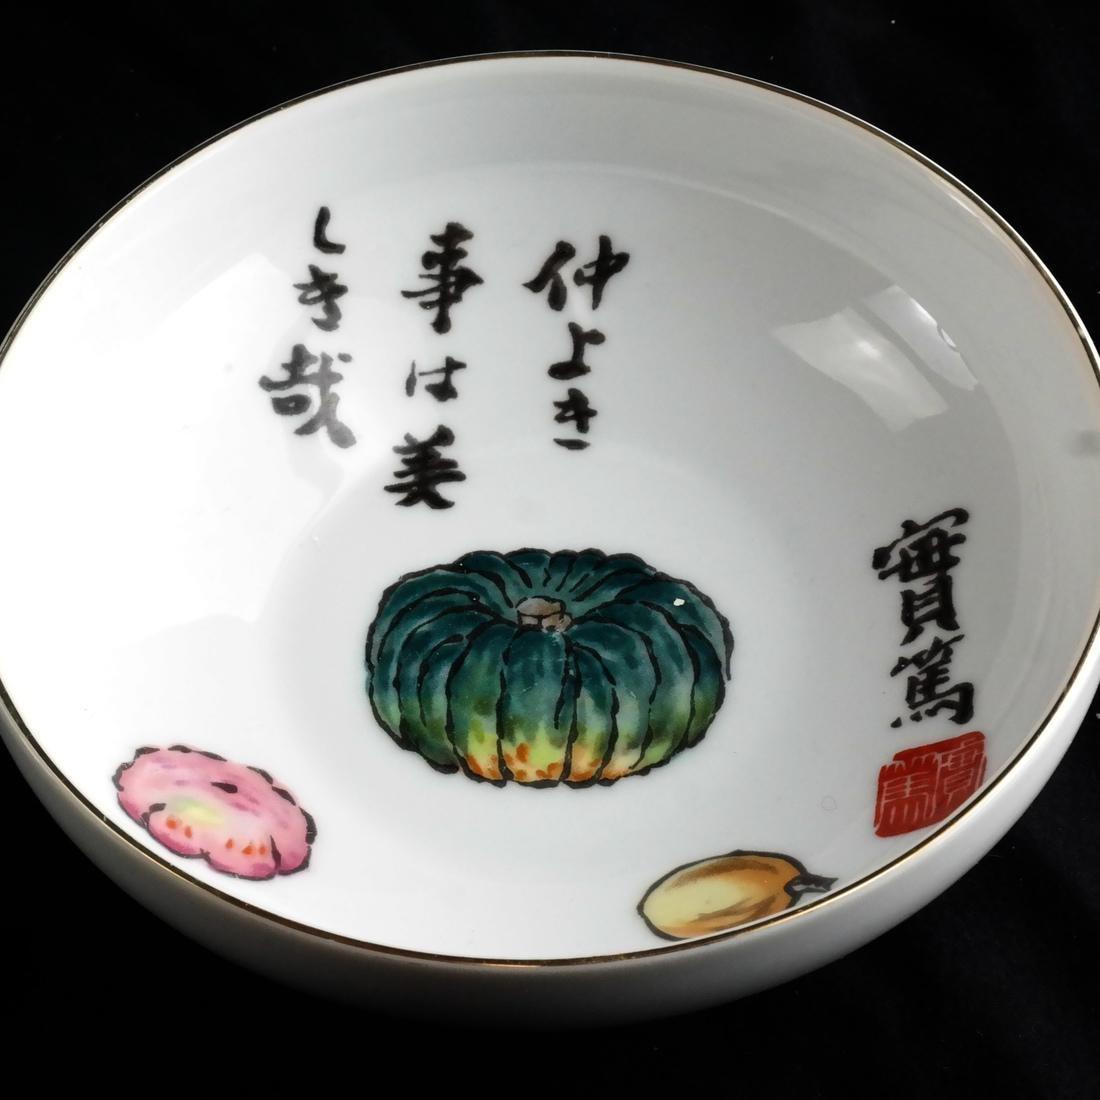 Chinese Seyei Porcelain Luncheon Set - 3